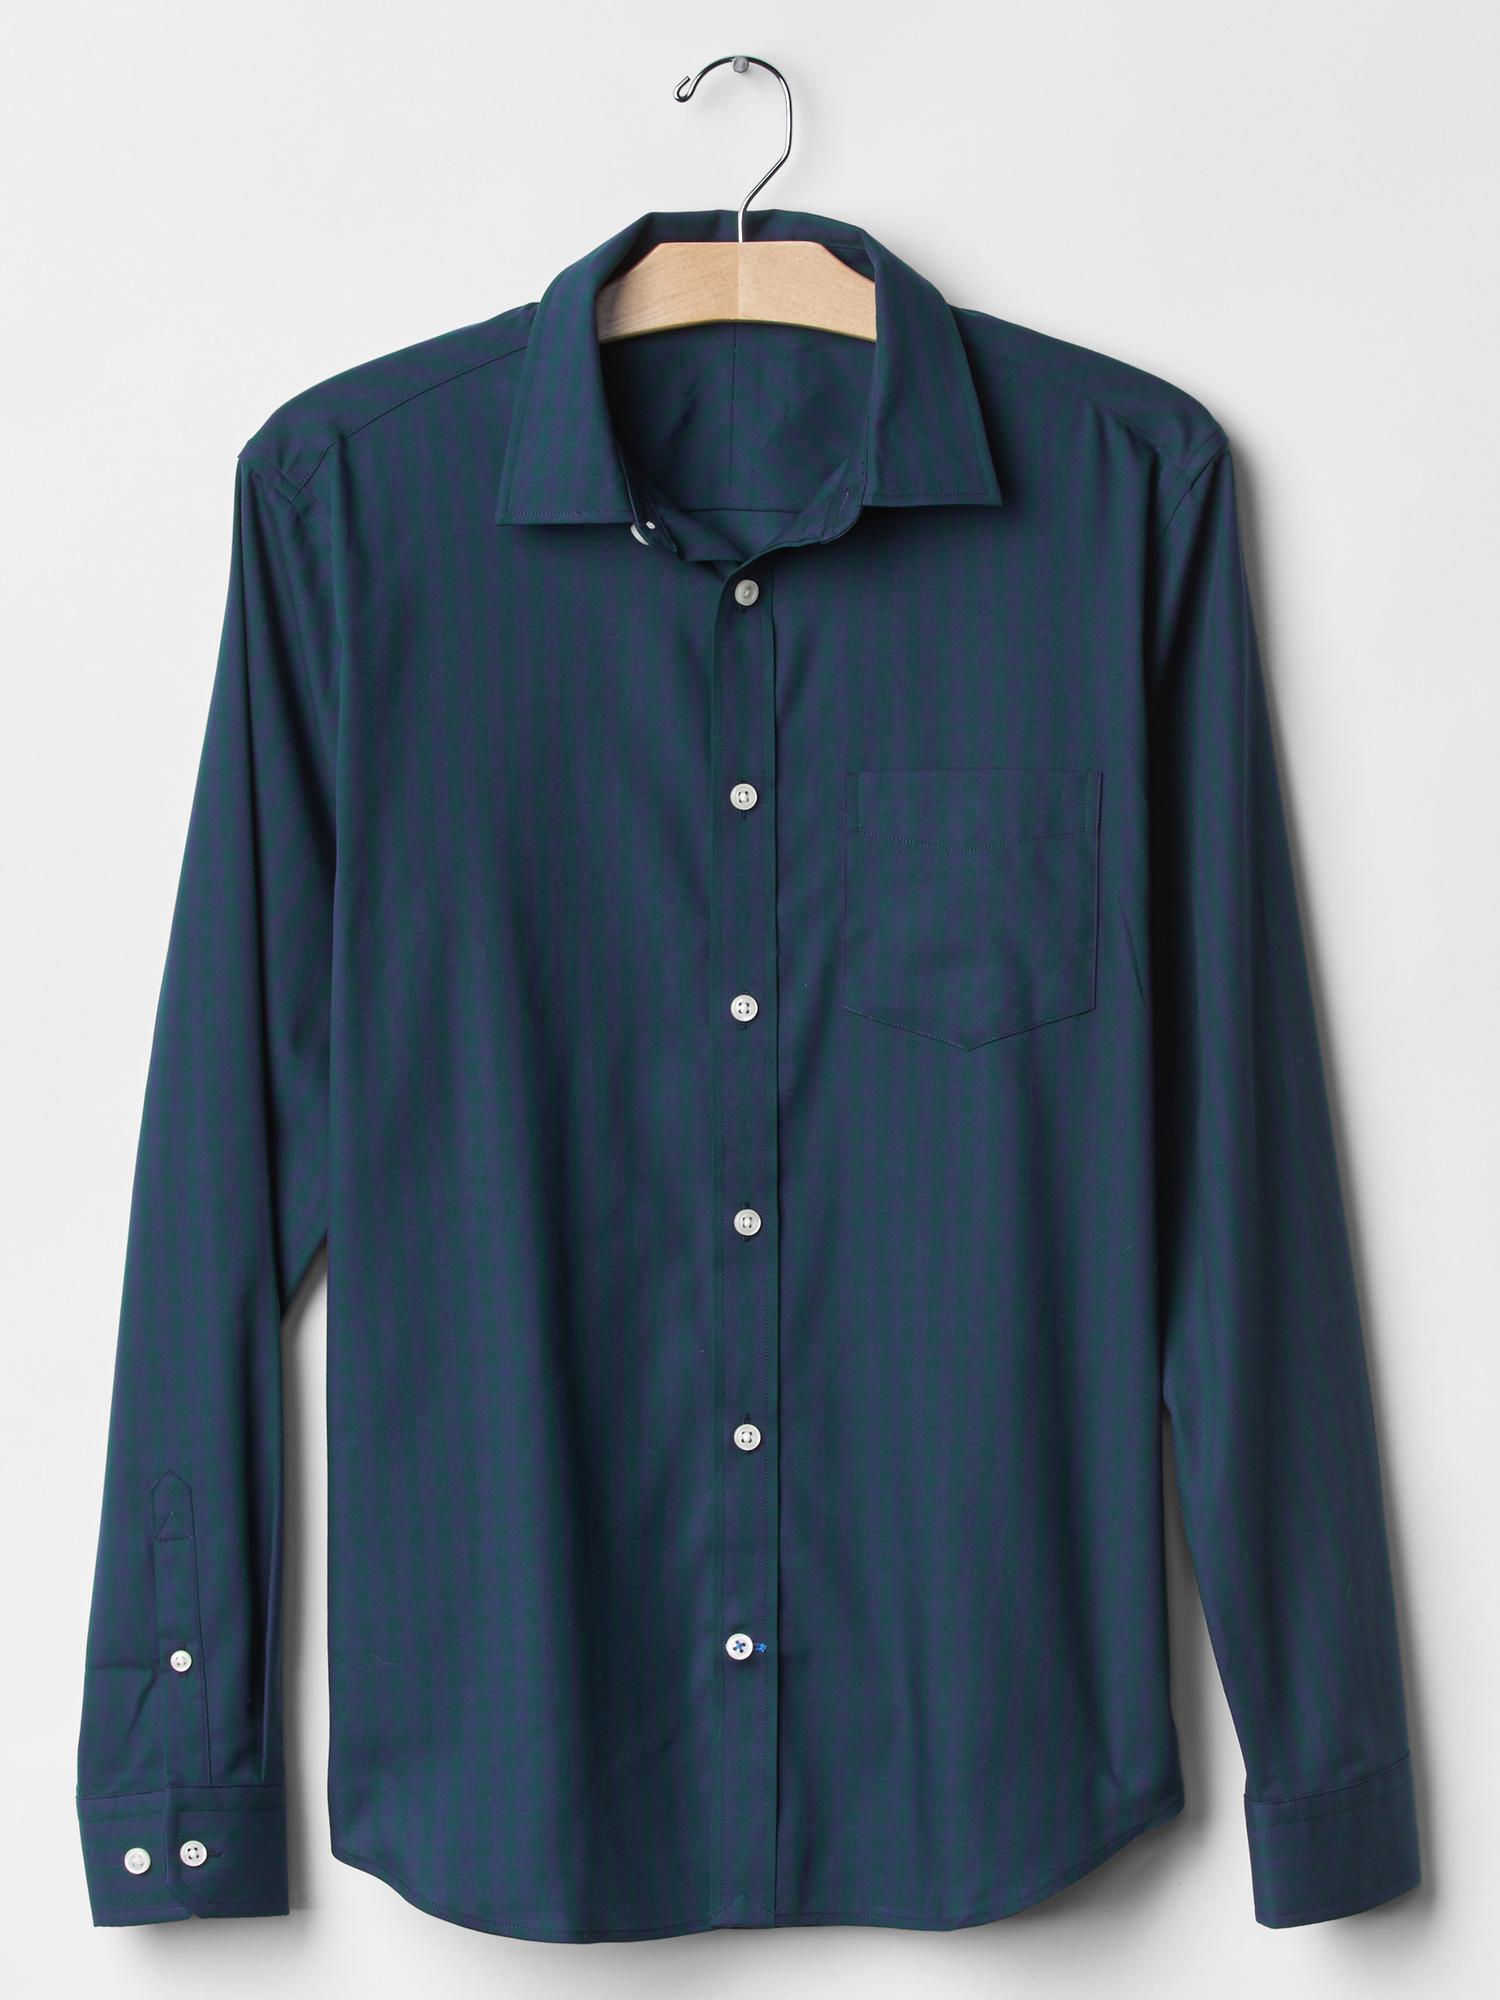 Gap wrinkle resistant gingham shirt slim fit in green for Wrinkle resistant dress shirts